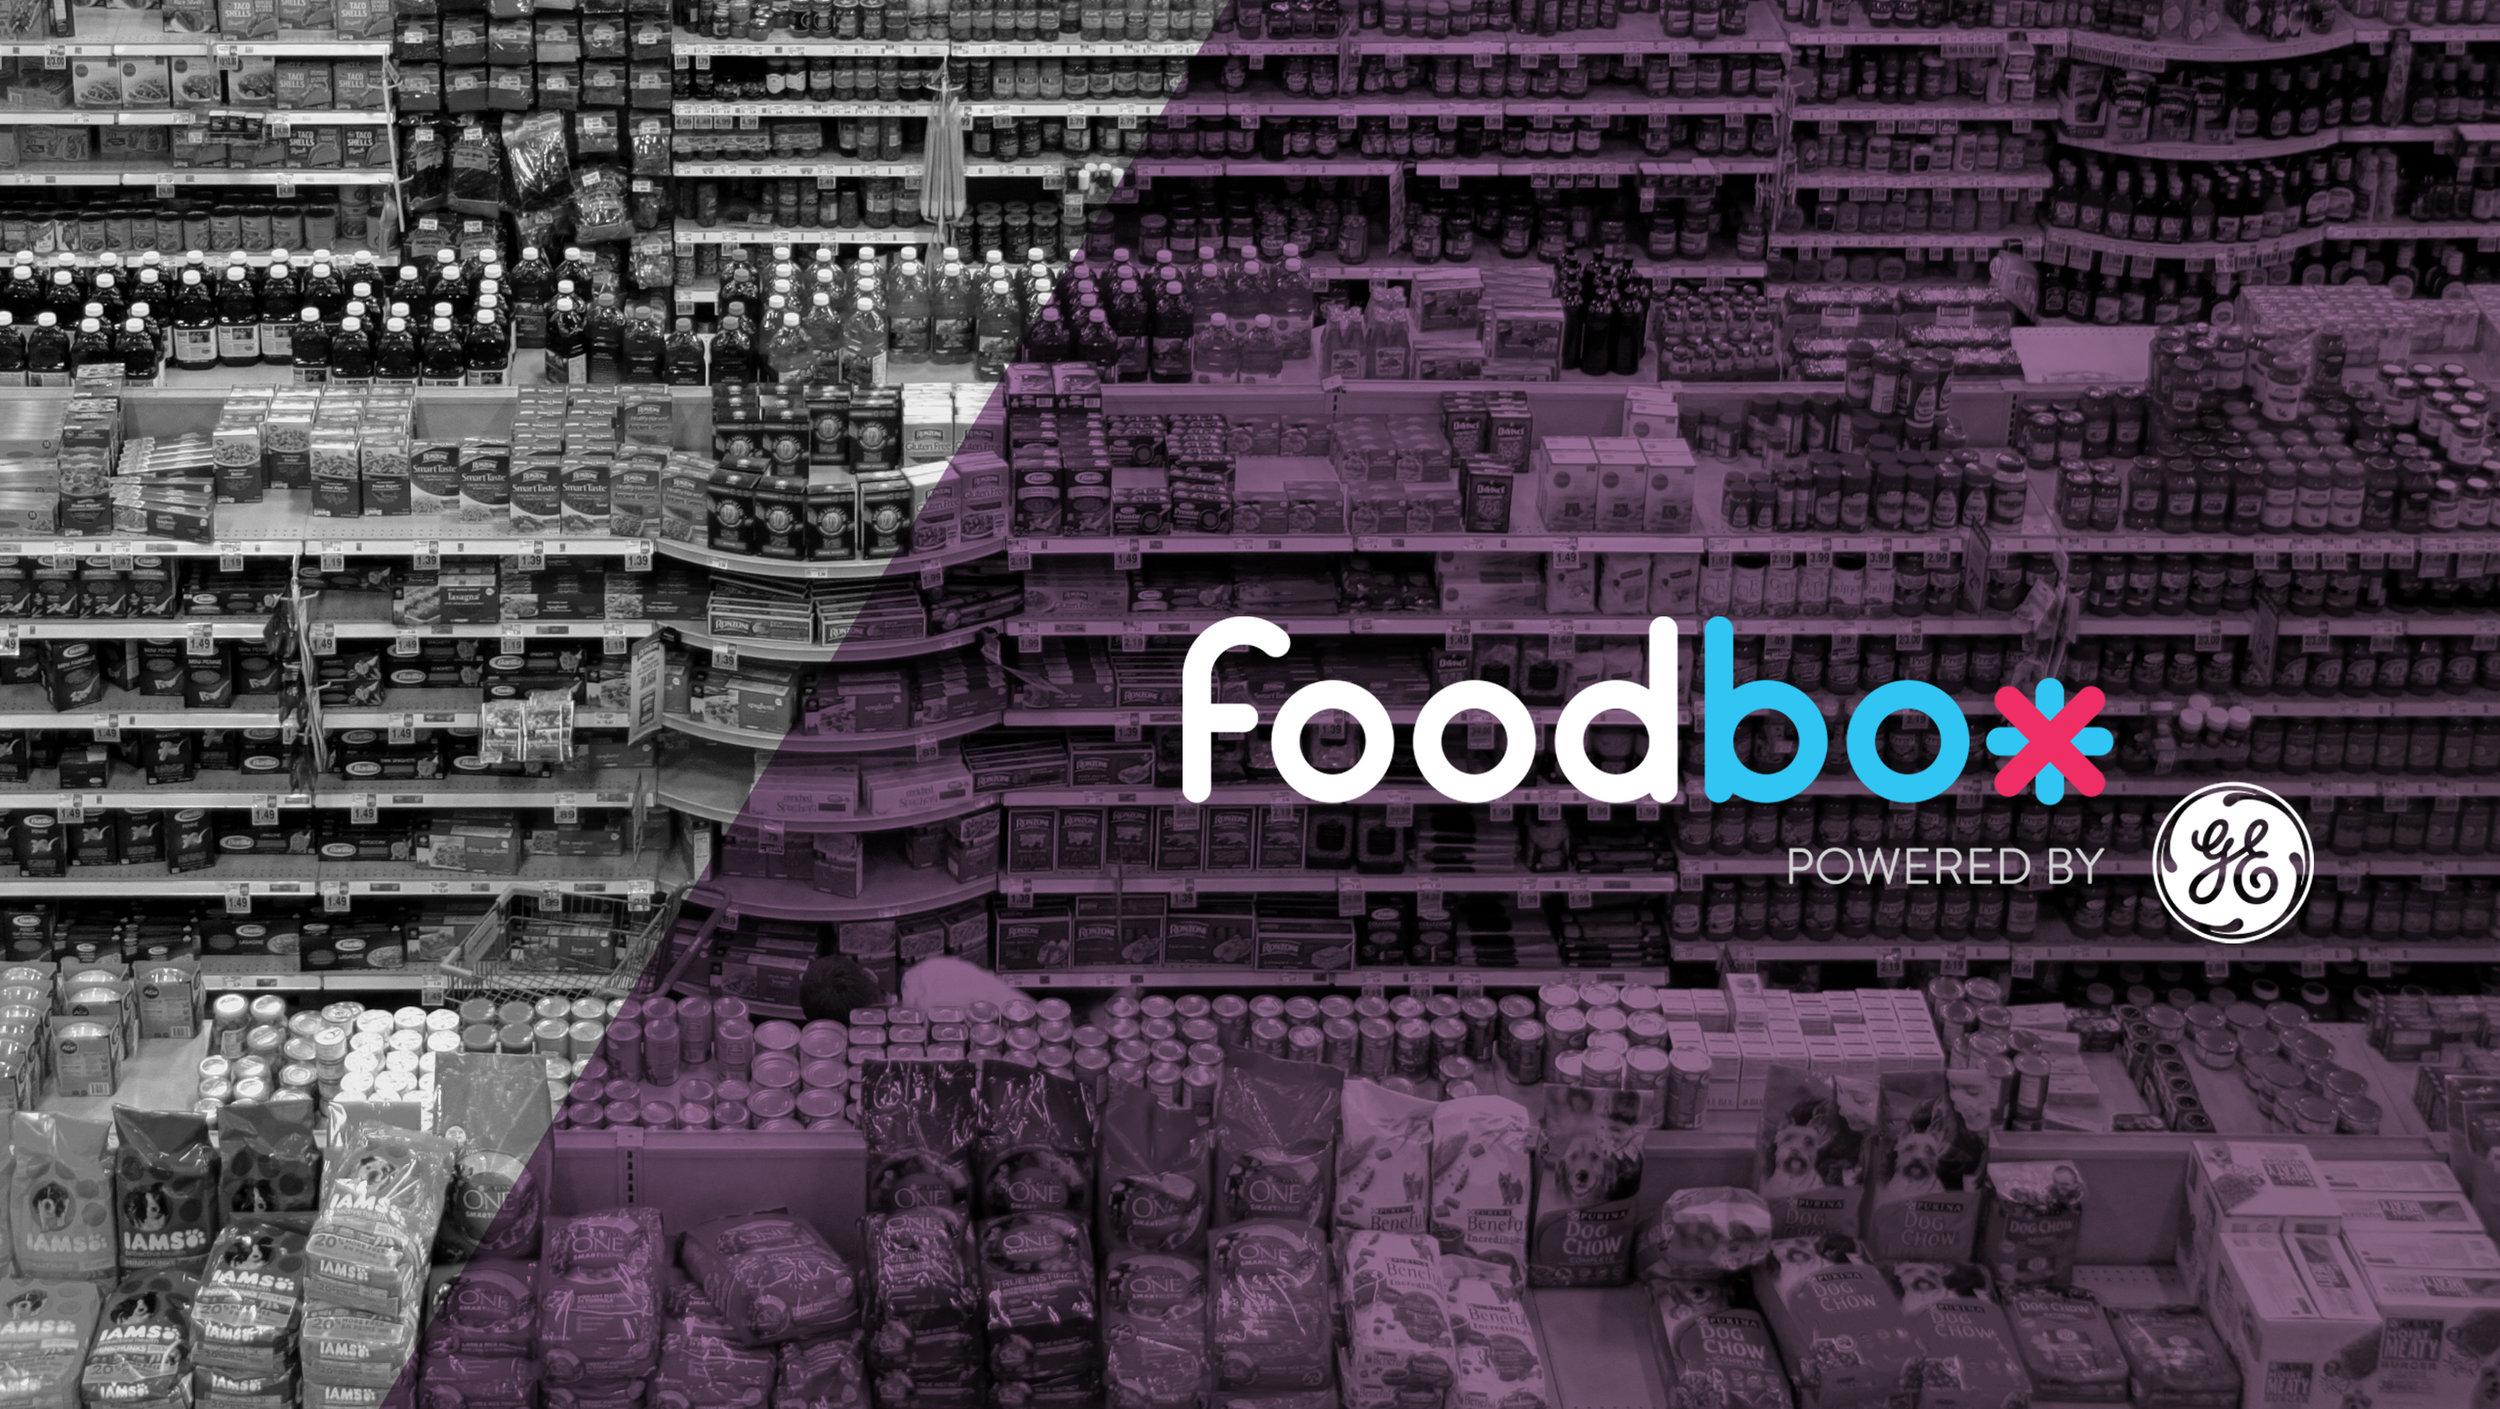 Foodbox-websiteheader.jpg